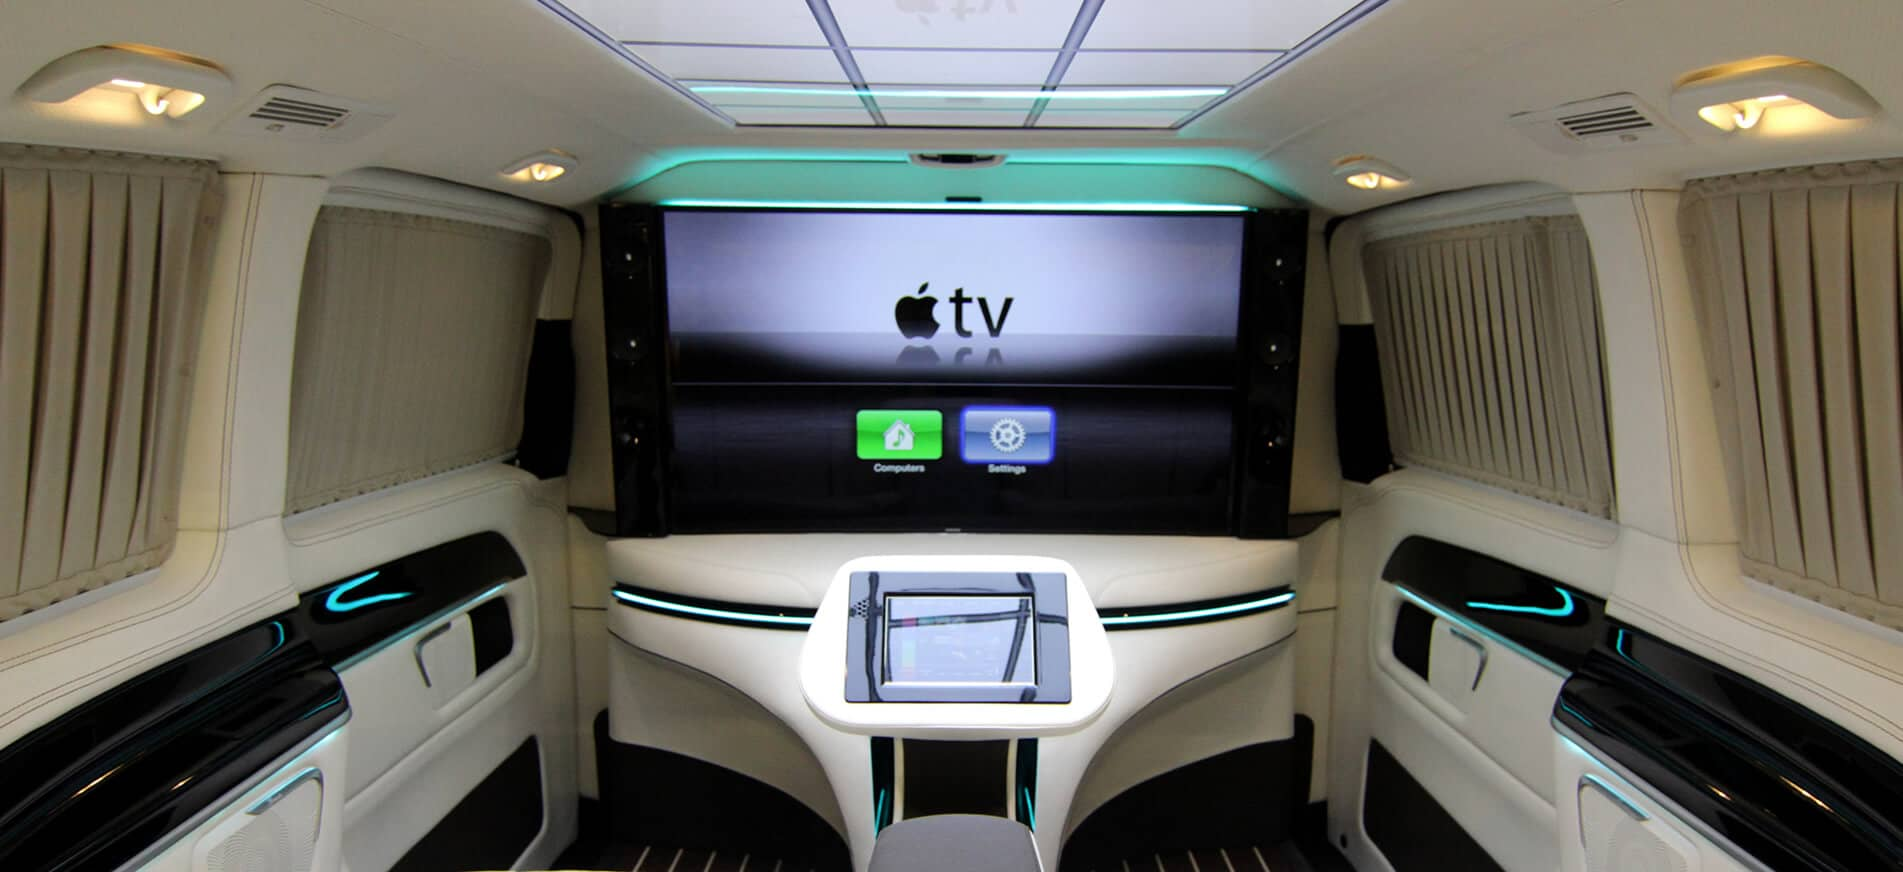 Custom Conversion Vans, Sprinters and SUVs | HQ Custom Design